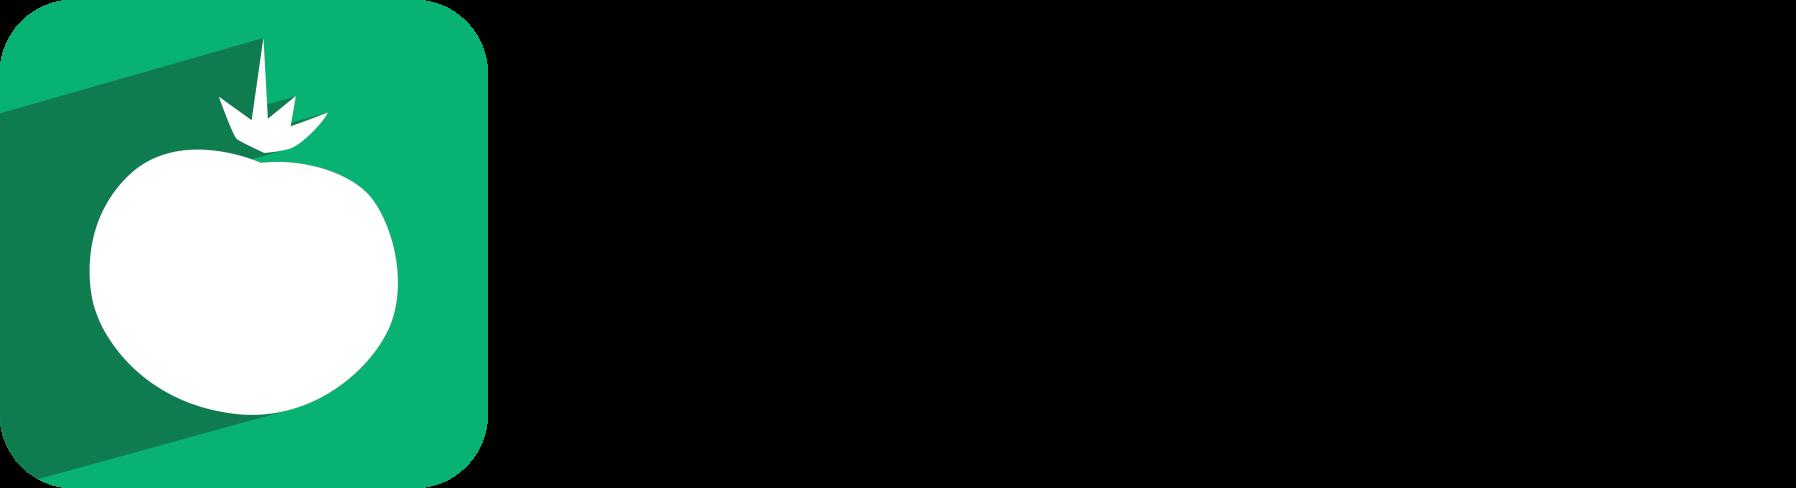 LogoV3_BLACK_TEXT